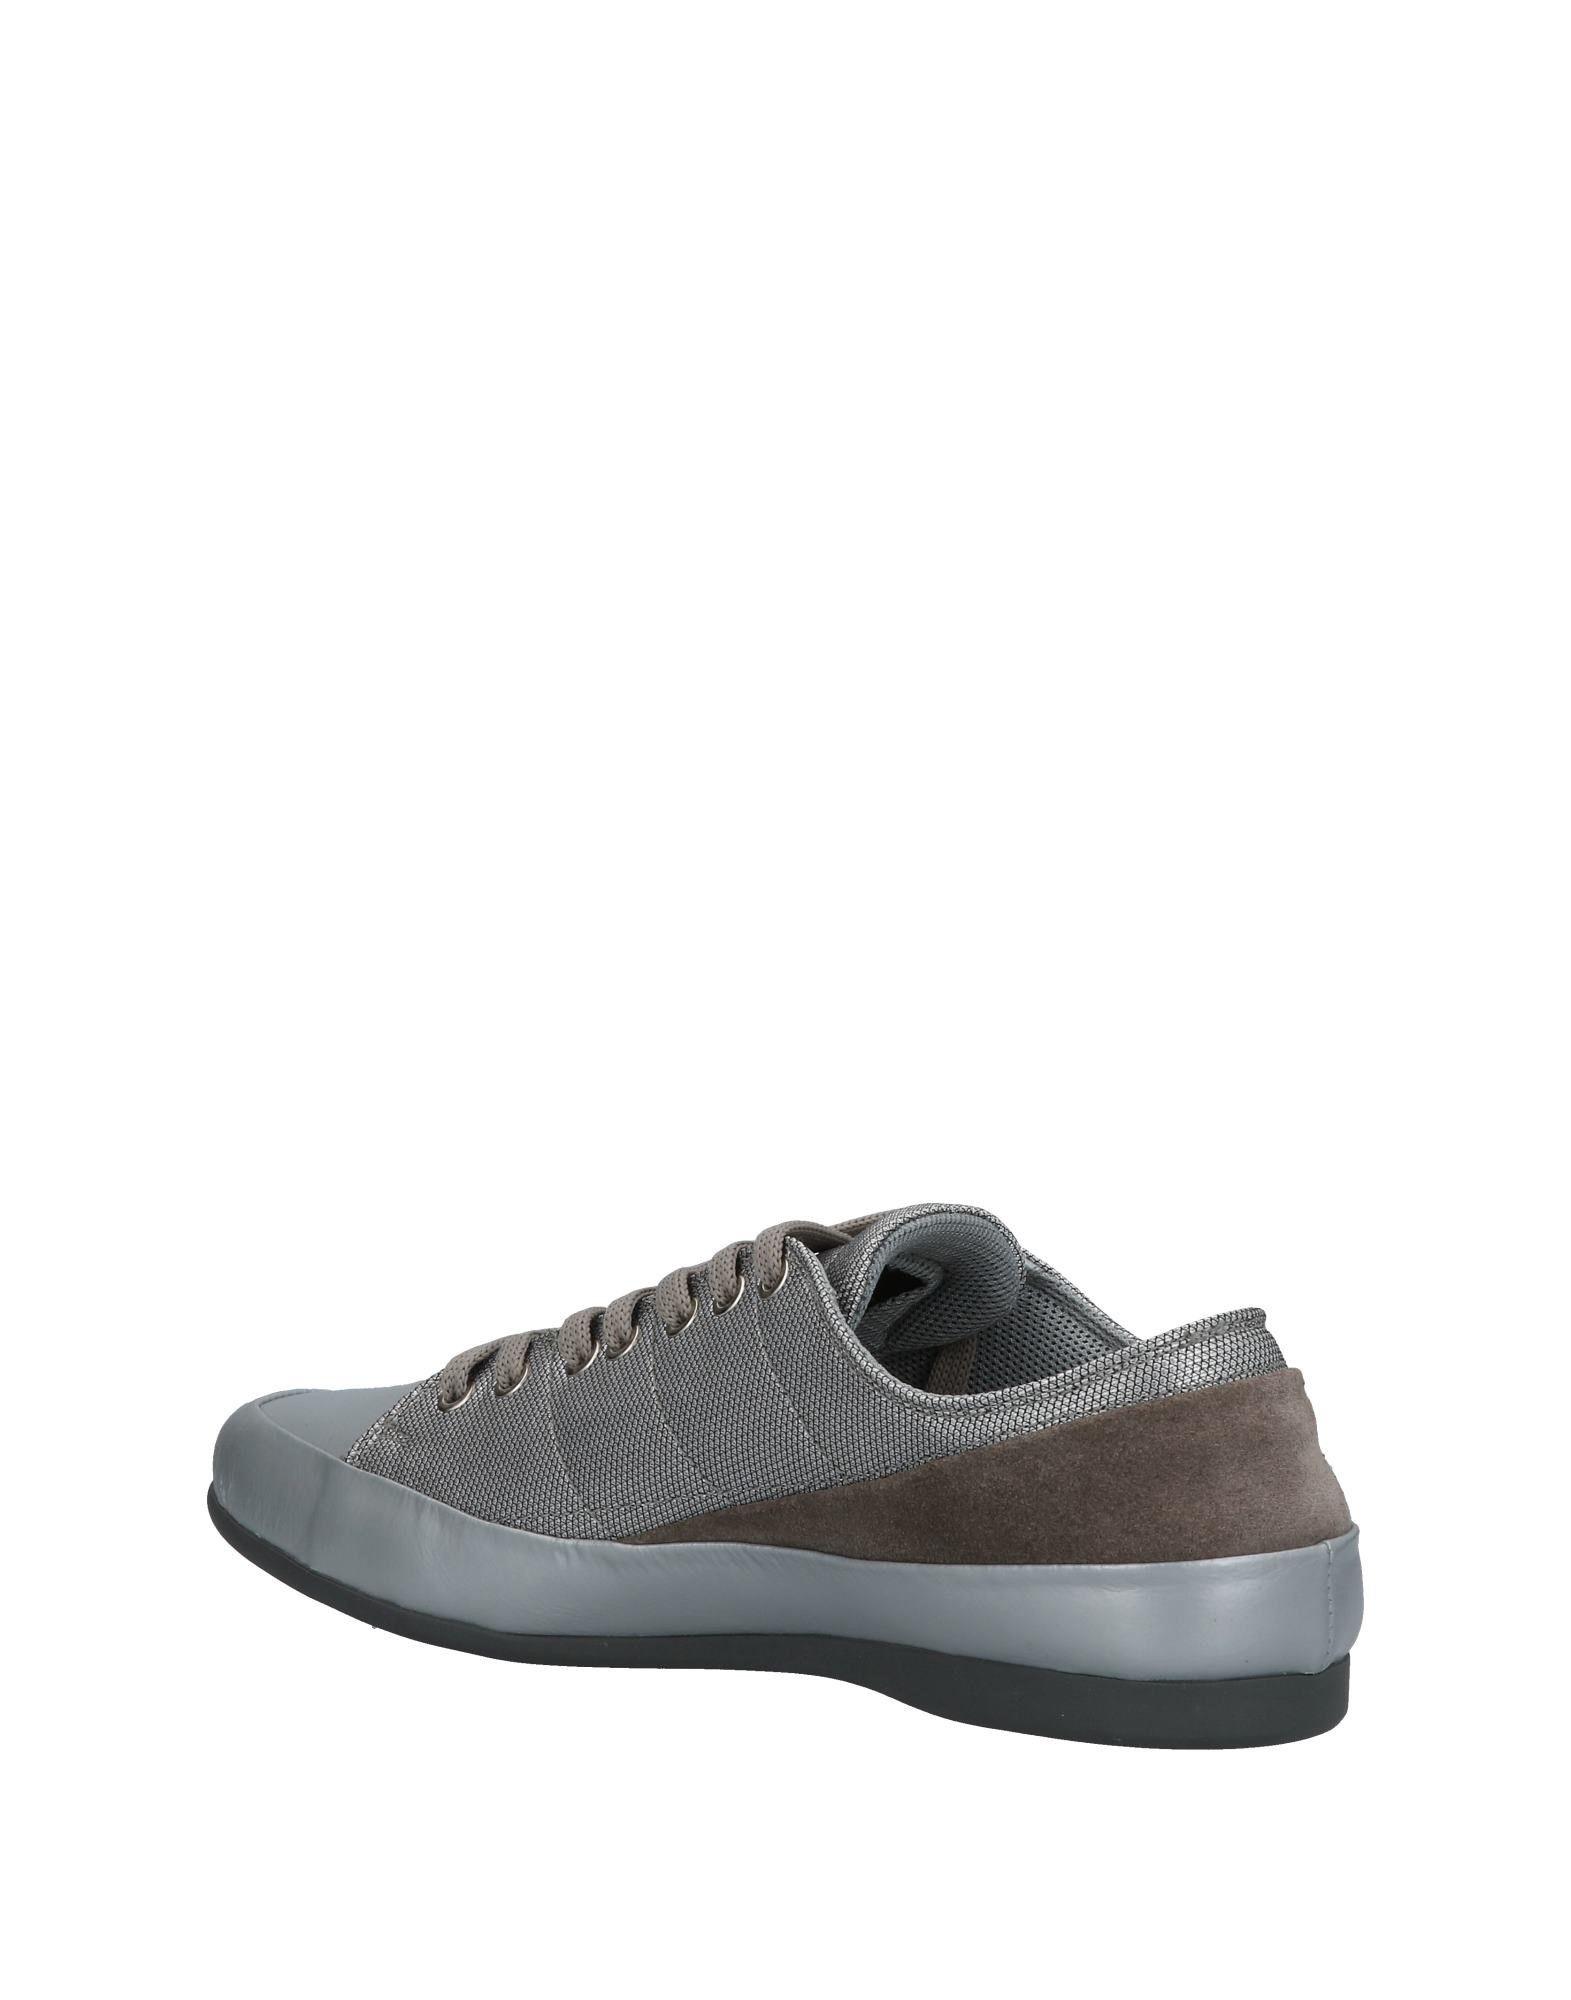 Sneakers Pirelli Pzero Homme - Sneakers Pirelli Pzero sur